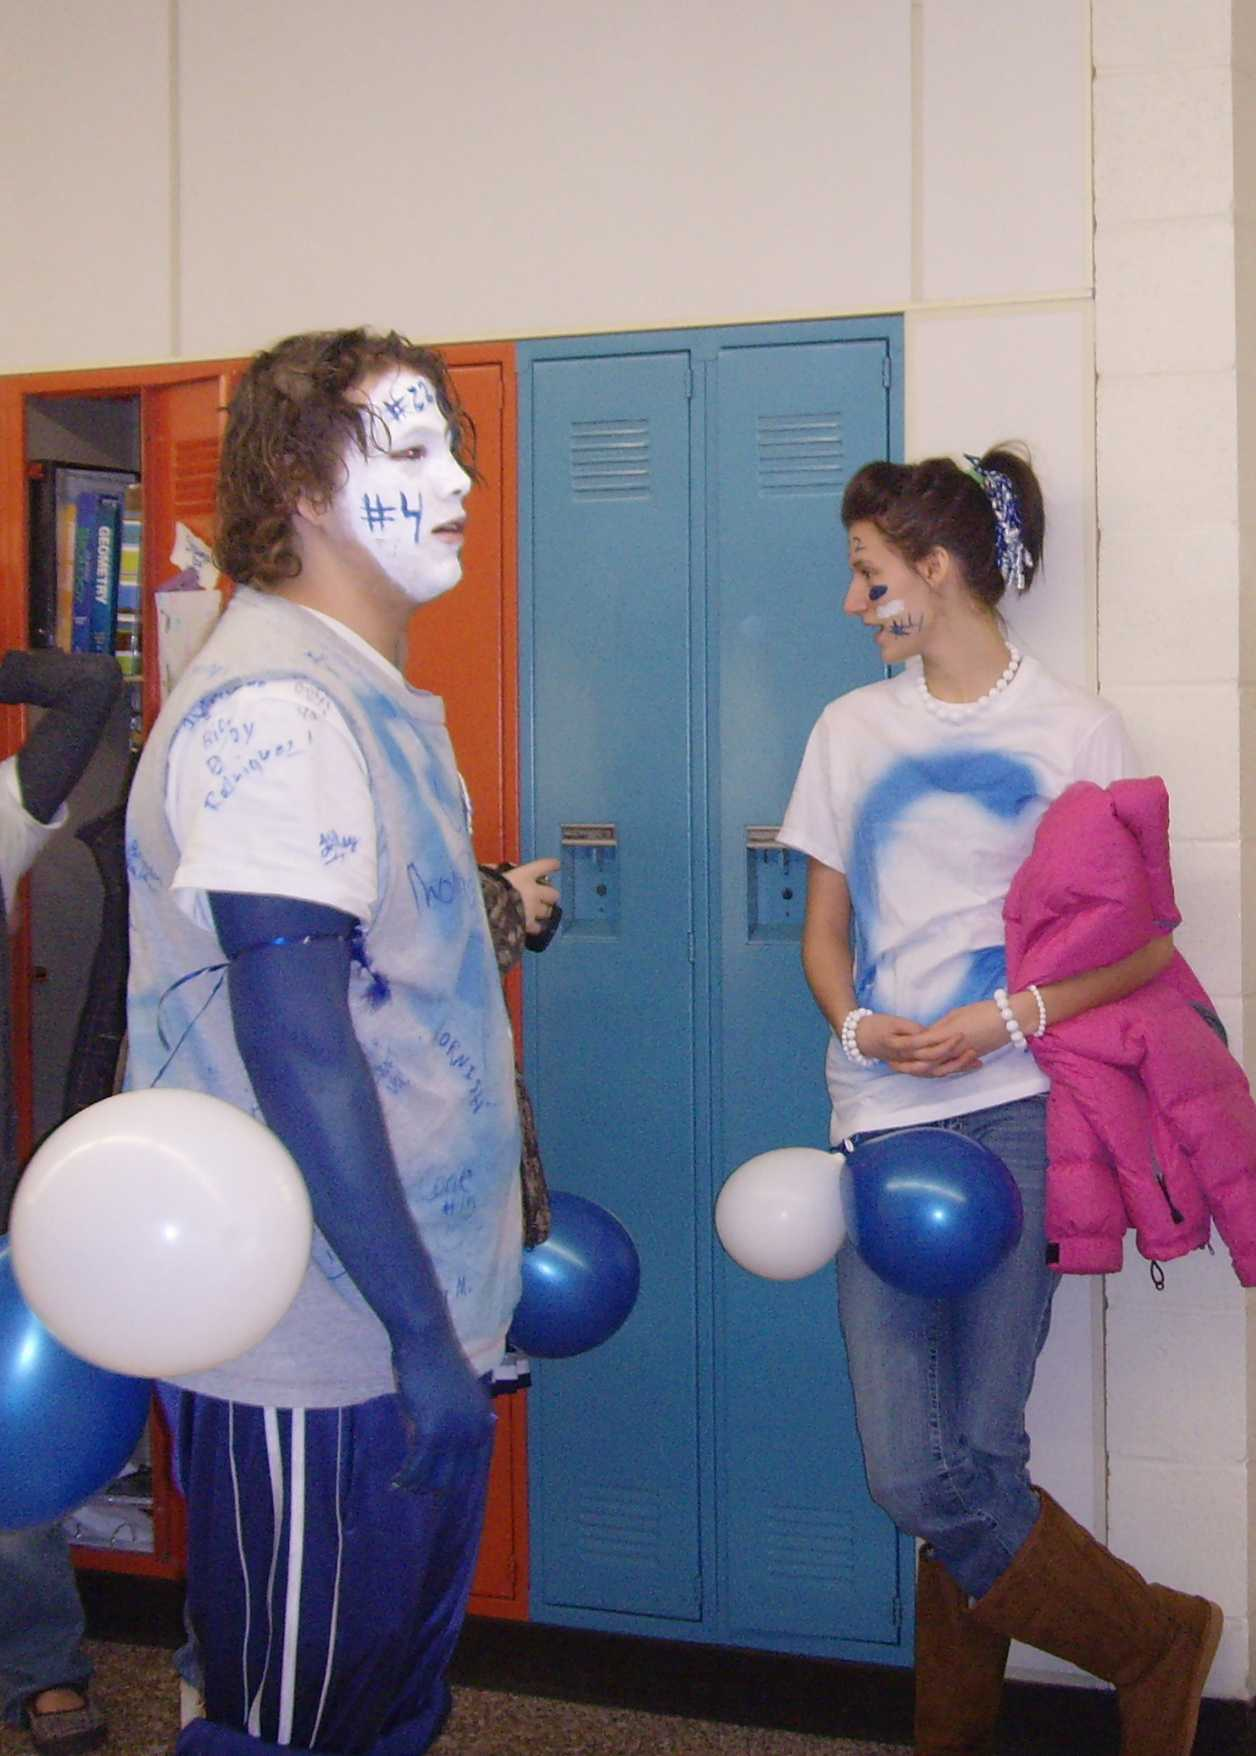 DJ Reed and Rhonda Garrett linger in the halls during Homecoming Week.